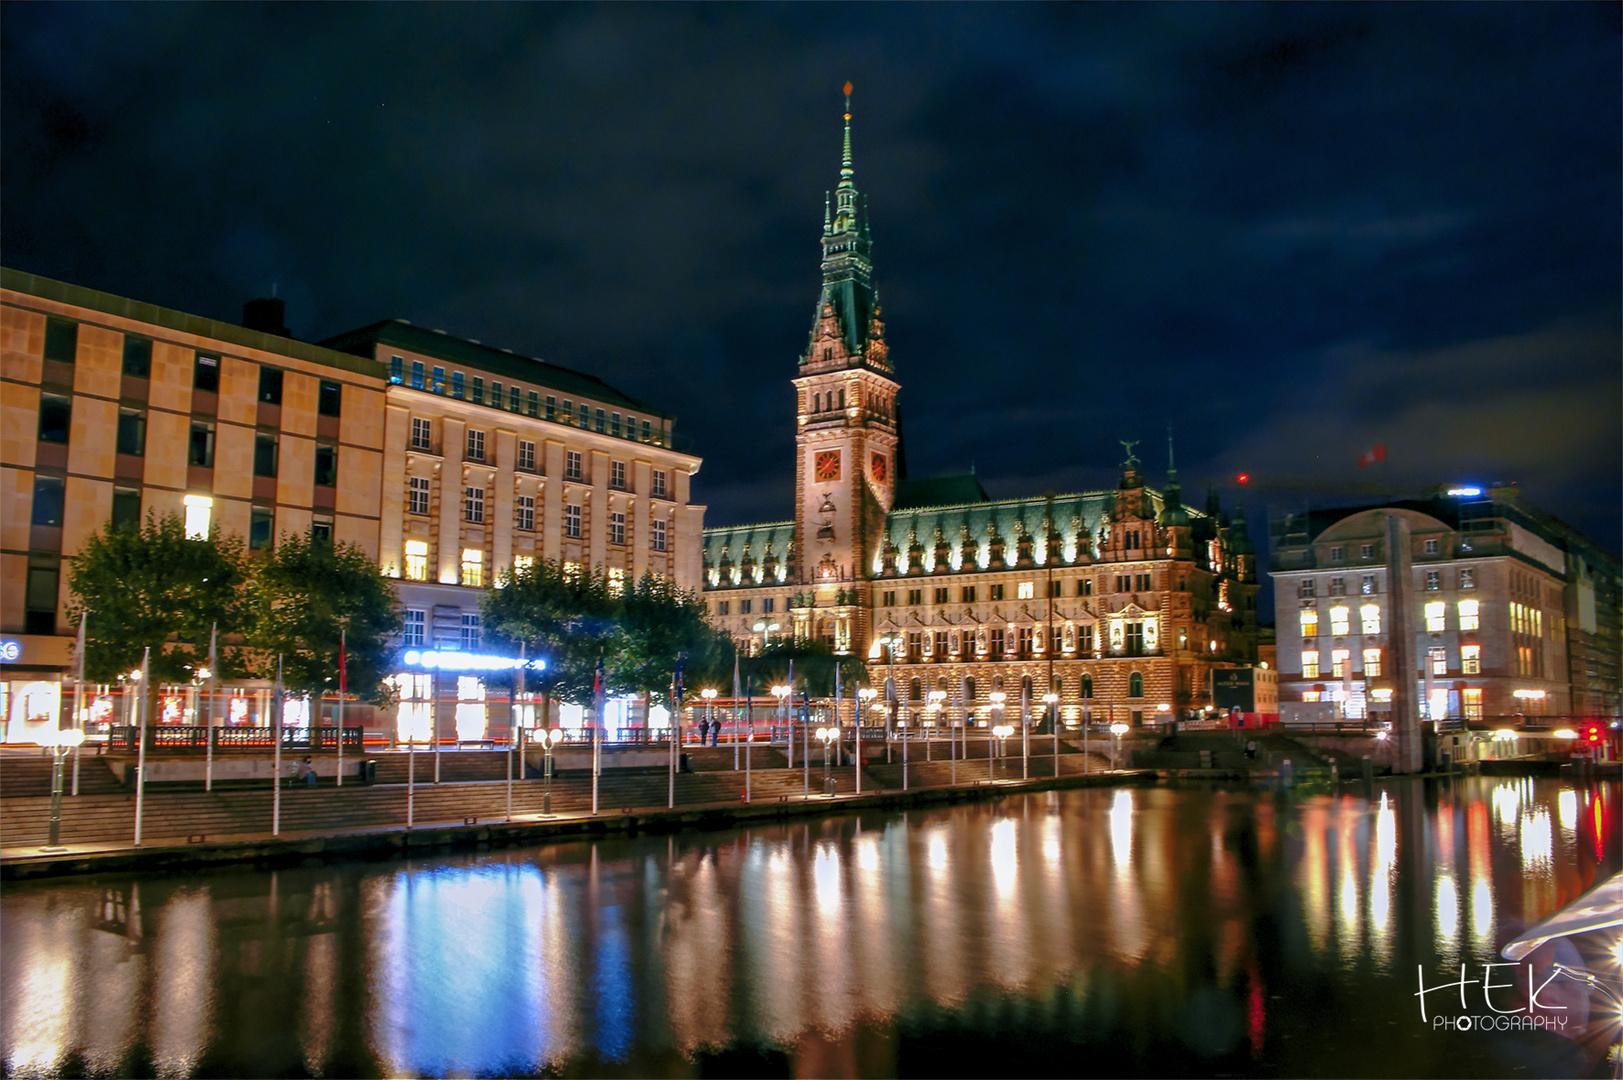 Das Rathaus - Hamburg, De